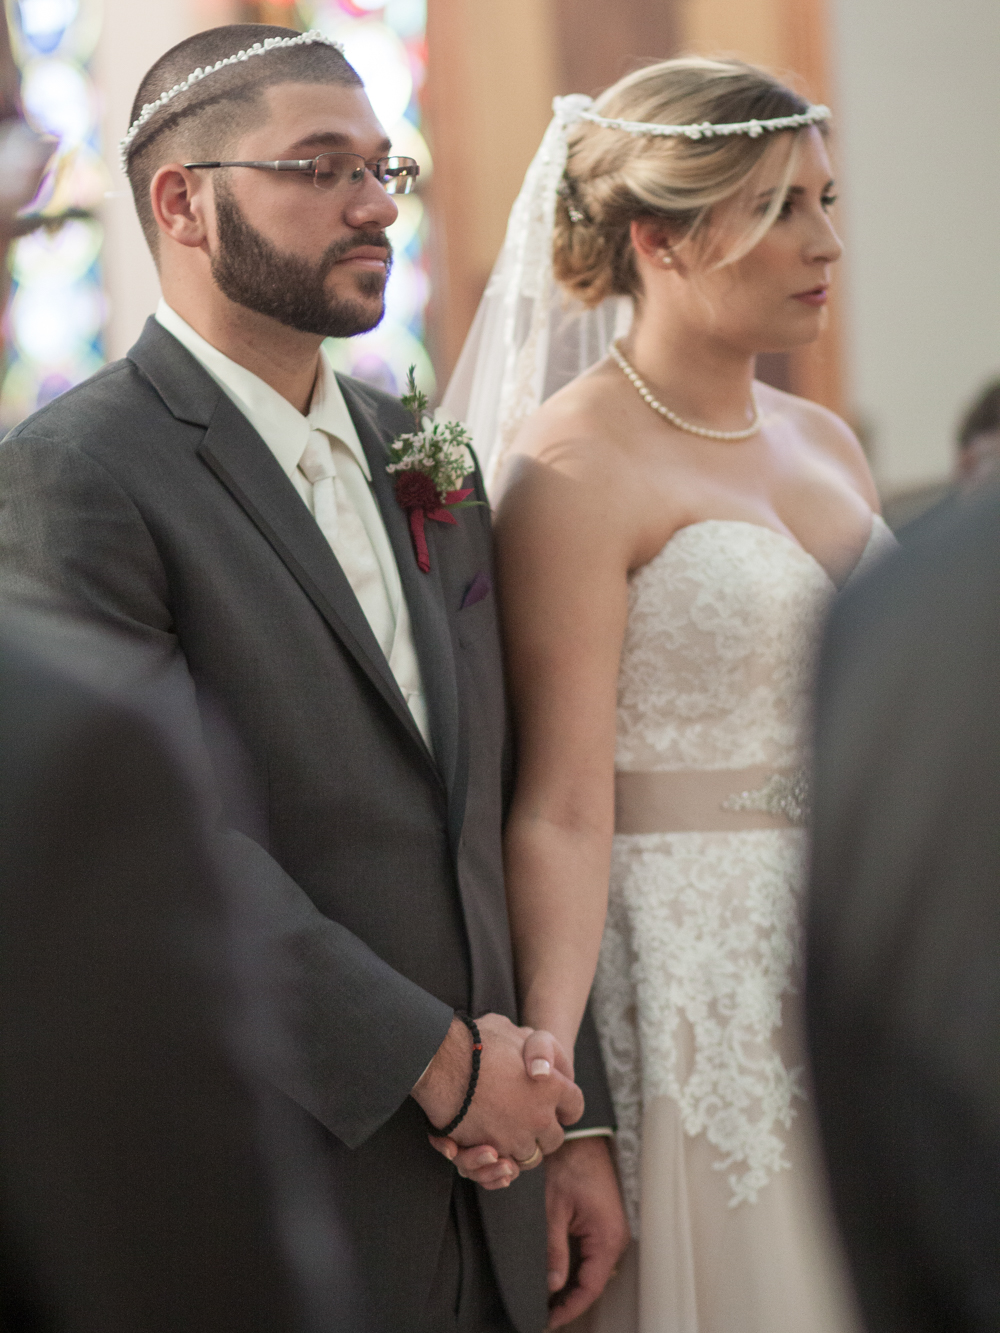 Houston wedding photographer - Christine Gosch - Houston film photographer - greek wedding in Houston - Annunciation Greek Orthodox church in Houston, Texas - Houston wedding planner -32.jpg